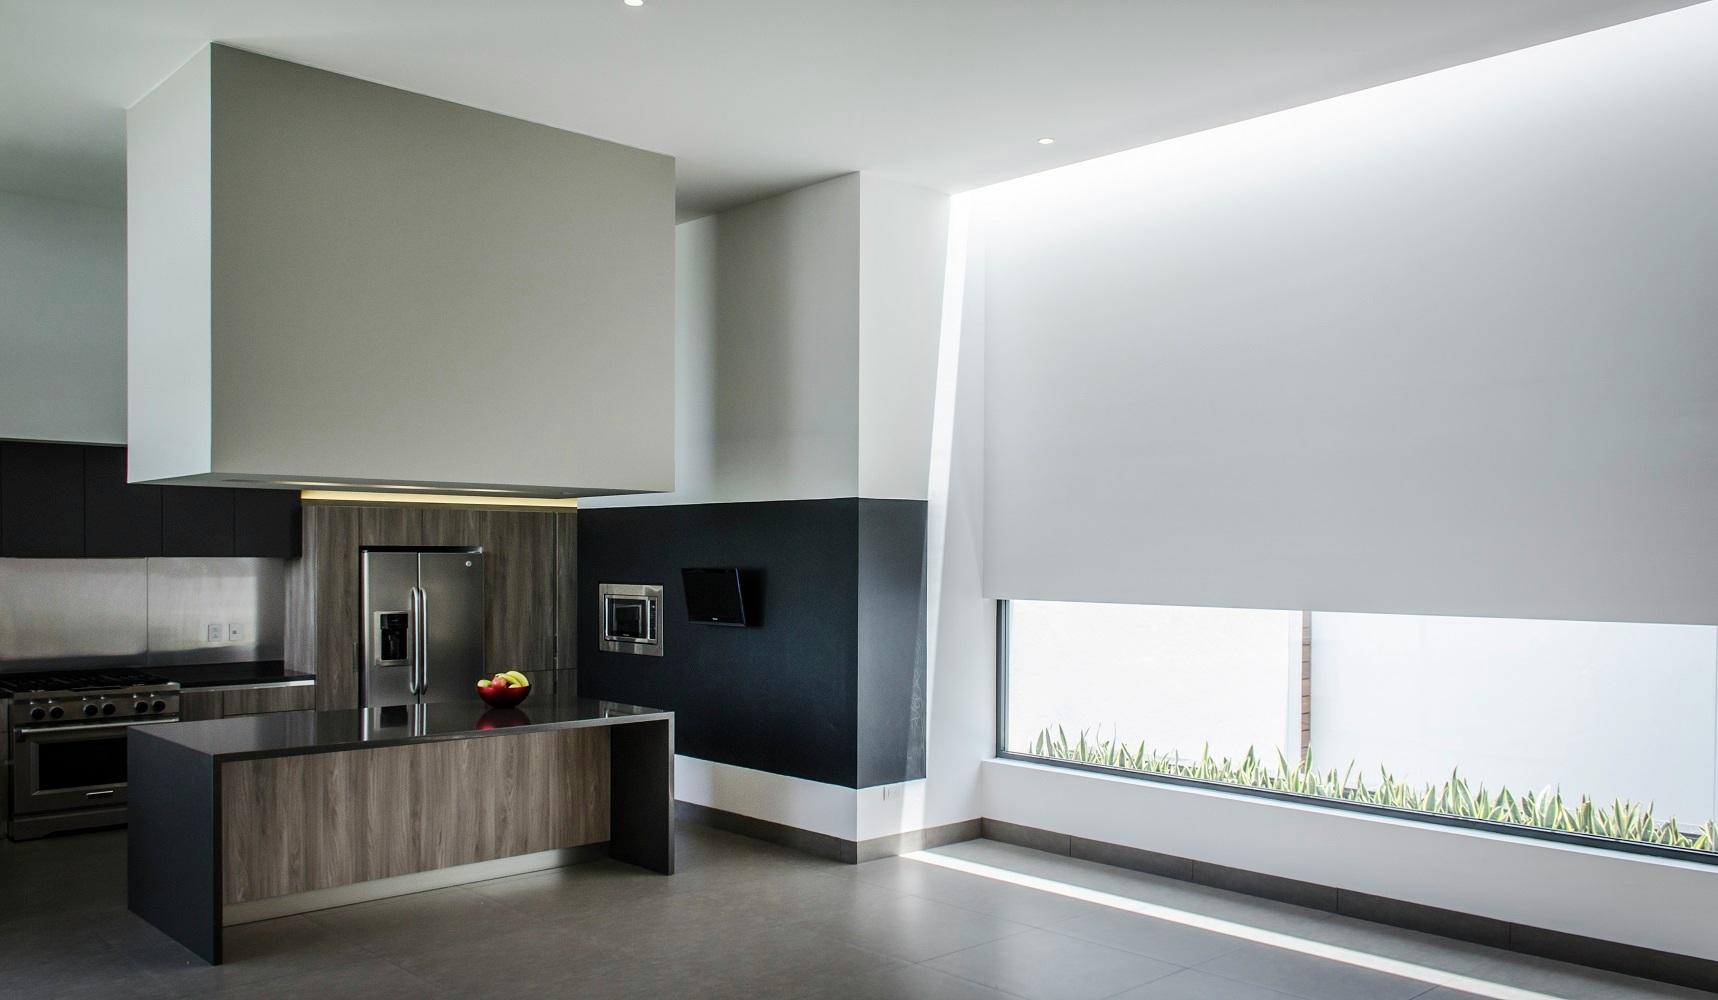 Galer a de casa b g adi arquitectura y dise o interior 6 for Arquitectura y diseno interior